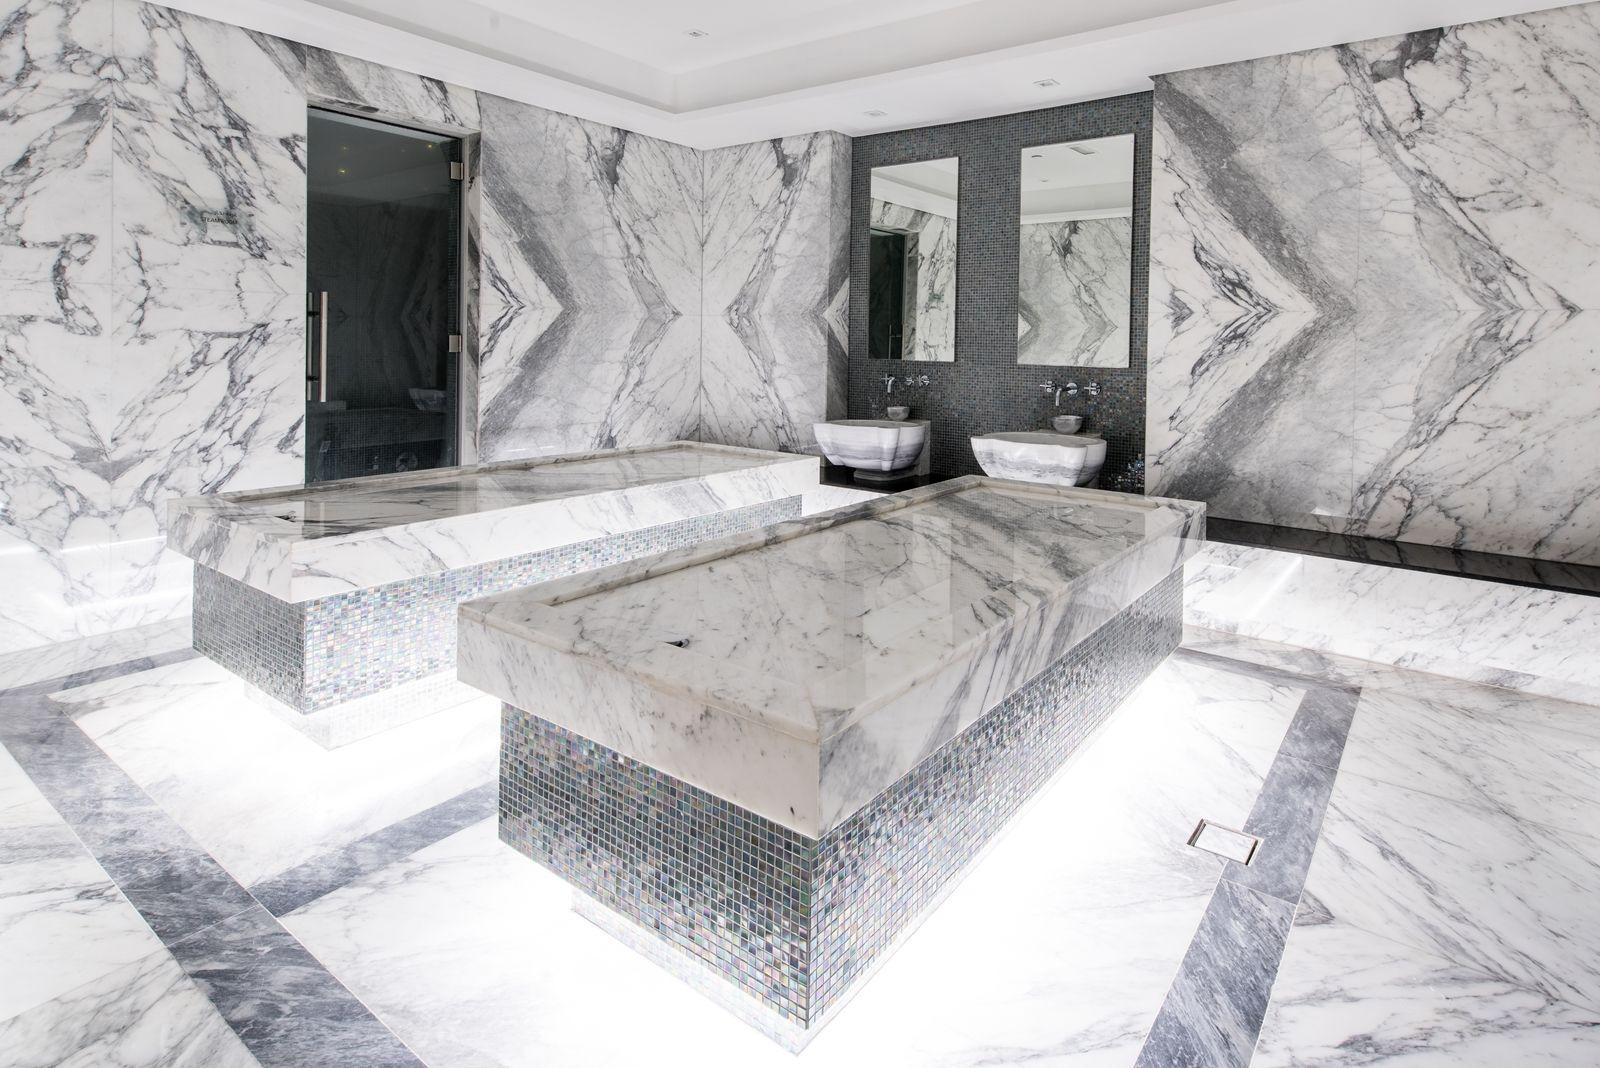 Hamam With Scrub Room And Experience Shower Incl 2 Scrub Tables And 2 Kurnas Jpg Modern Banyo Tasarimi Luks Banyolar Tv Duvari